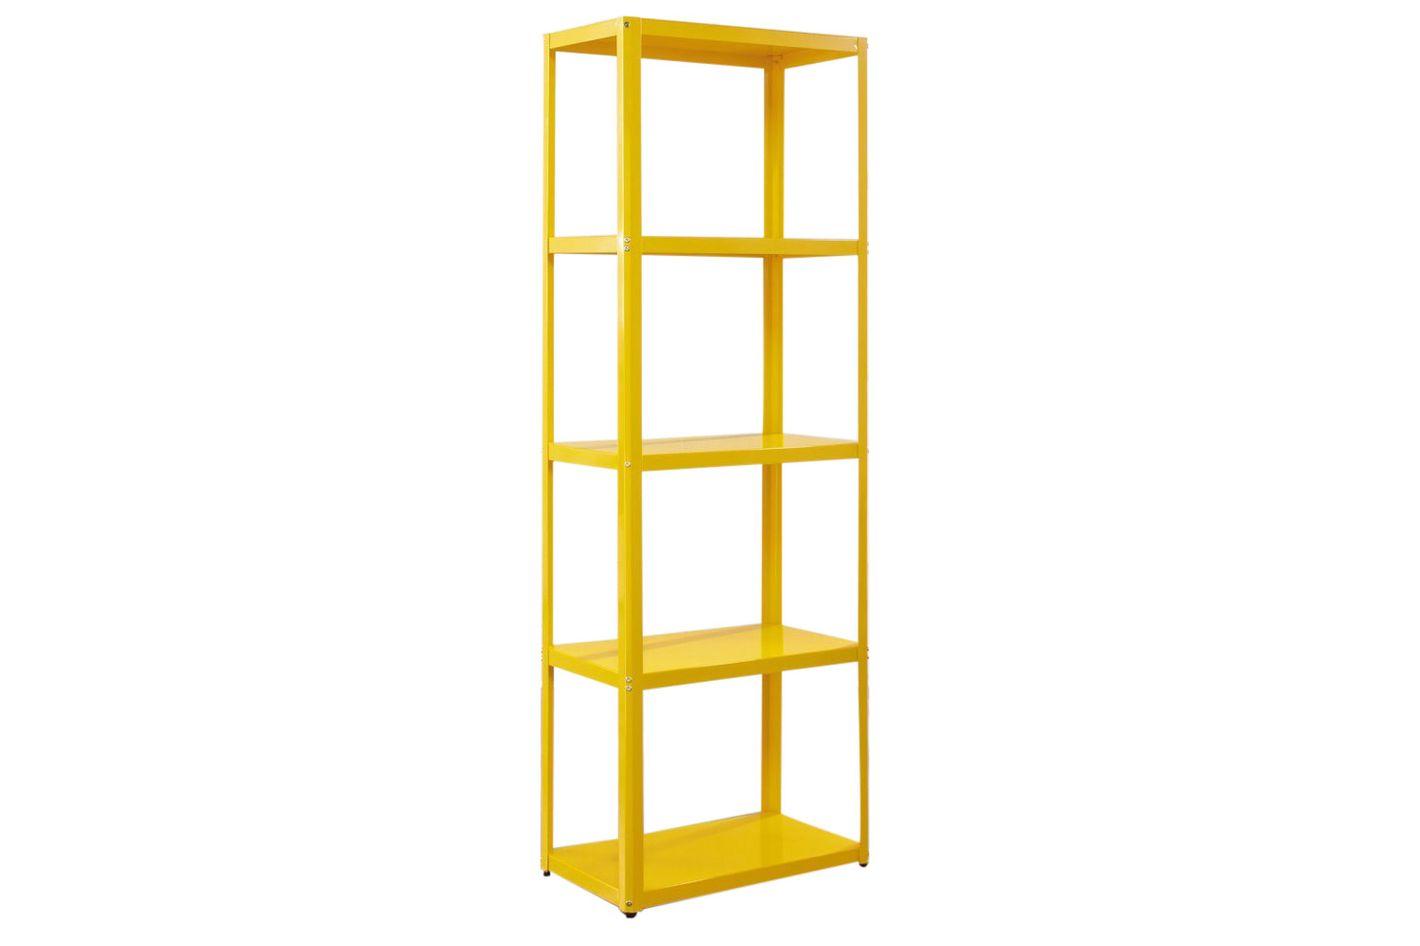 Sauder Soft Modern Tower Bookcase